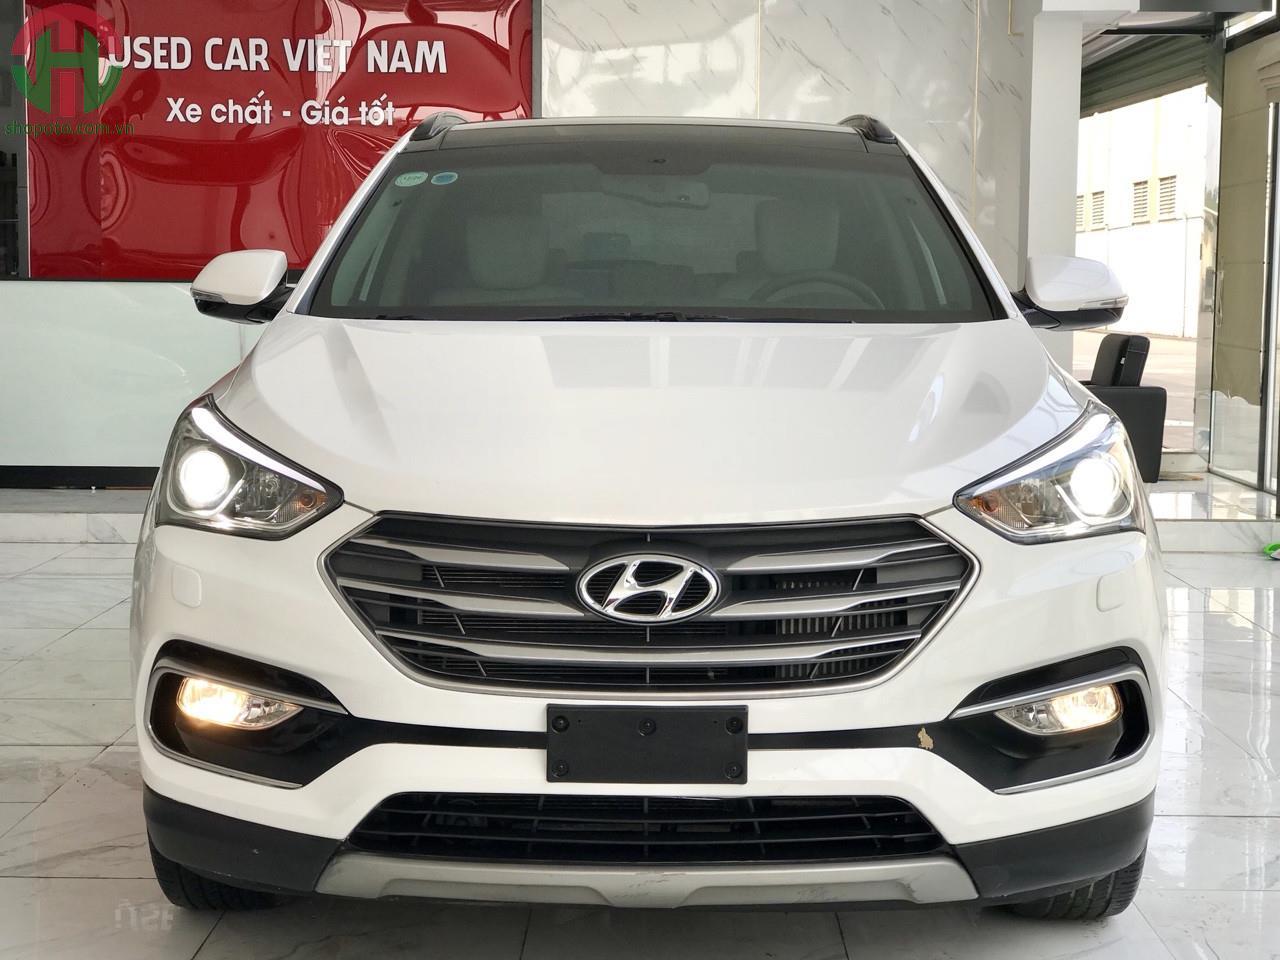 Hyundai Santafe 2.2 AT 4WD 2018 Full Dầu màu Trắng